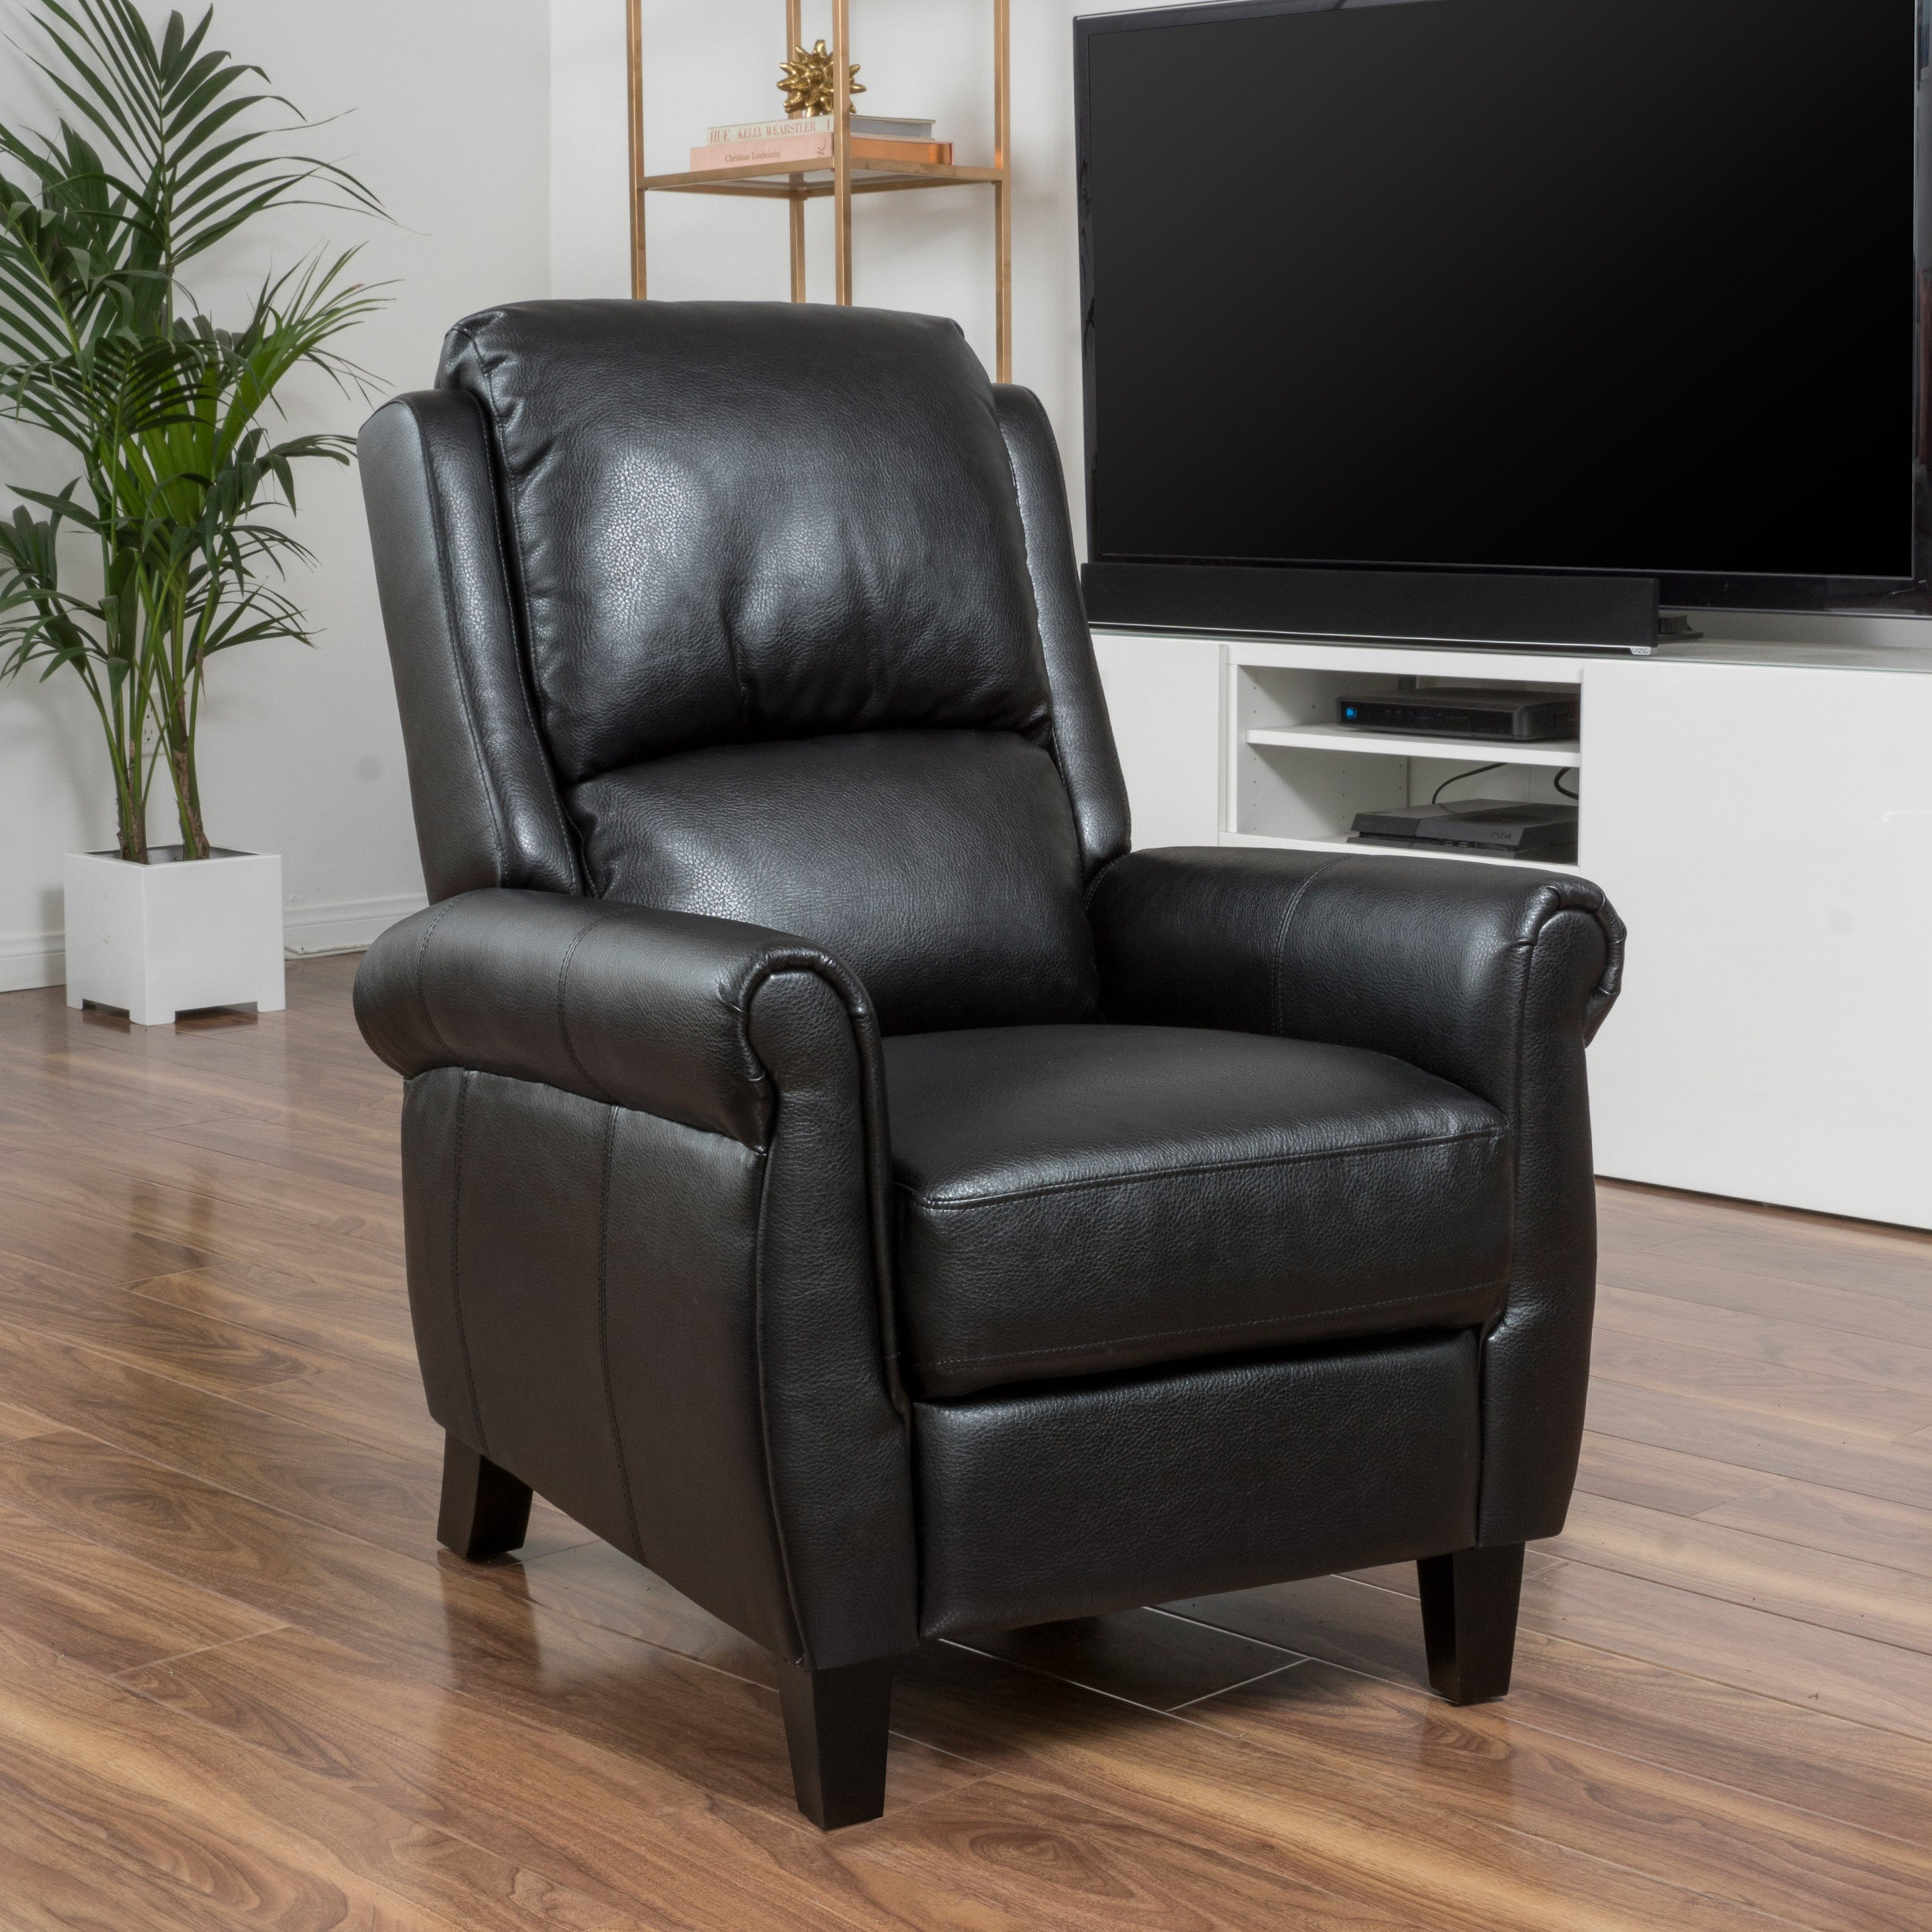 Club chair recliner - Advertisement